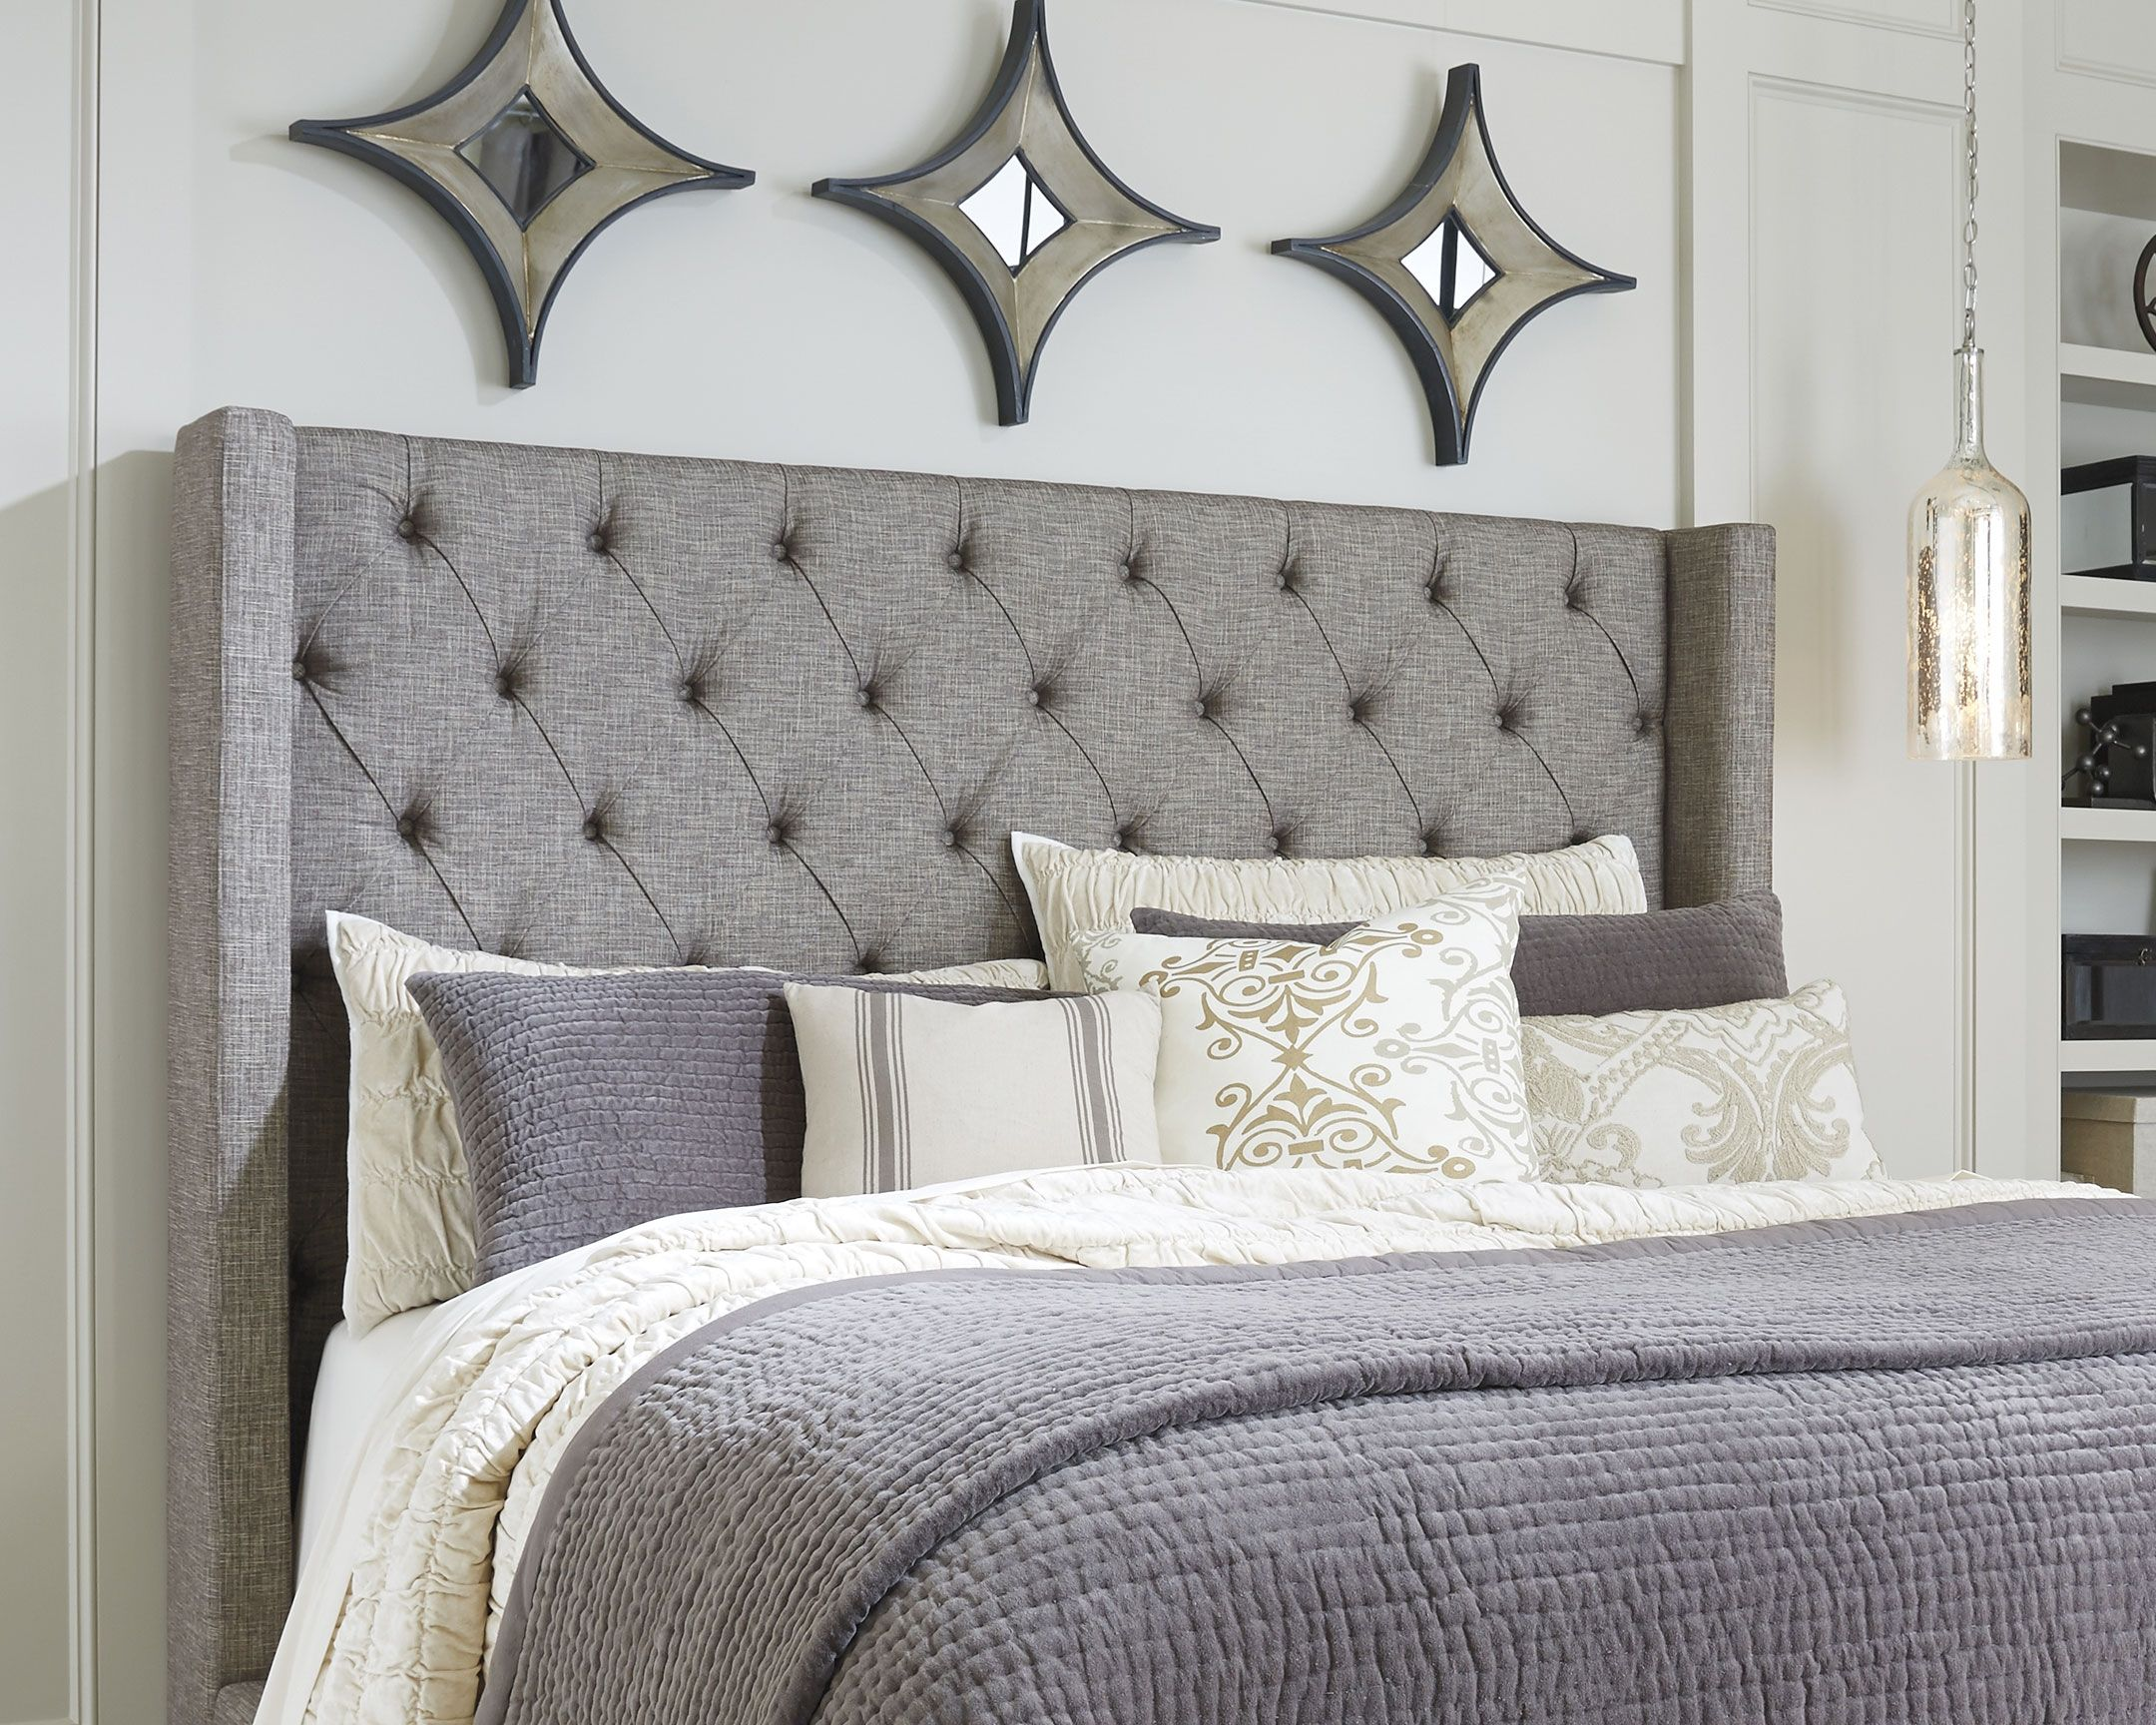 Sorinella King California King Upholstered Headboard Gray